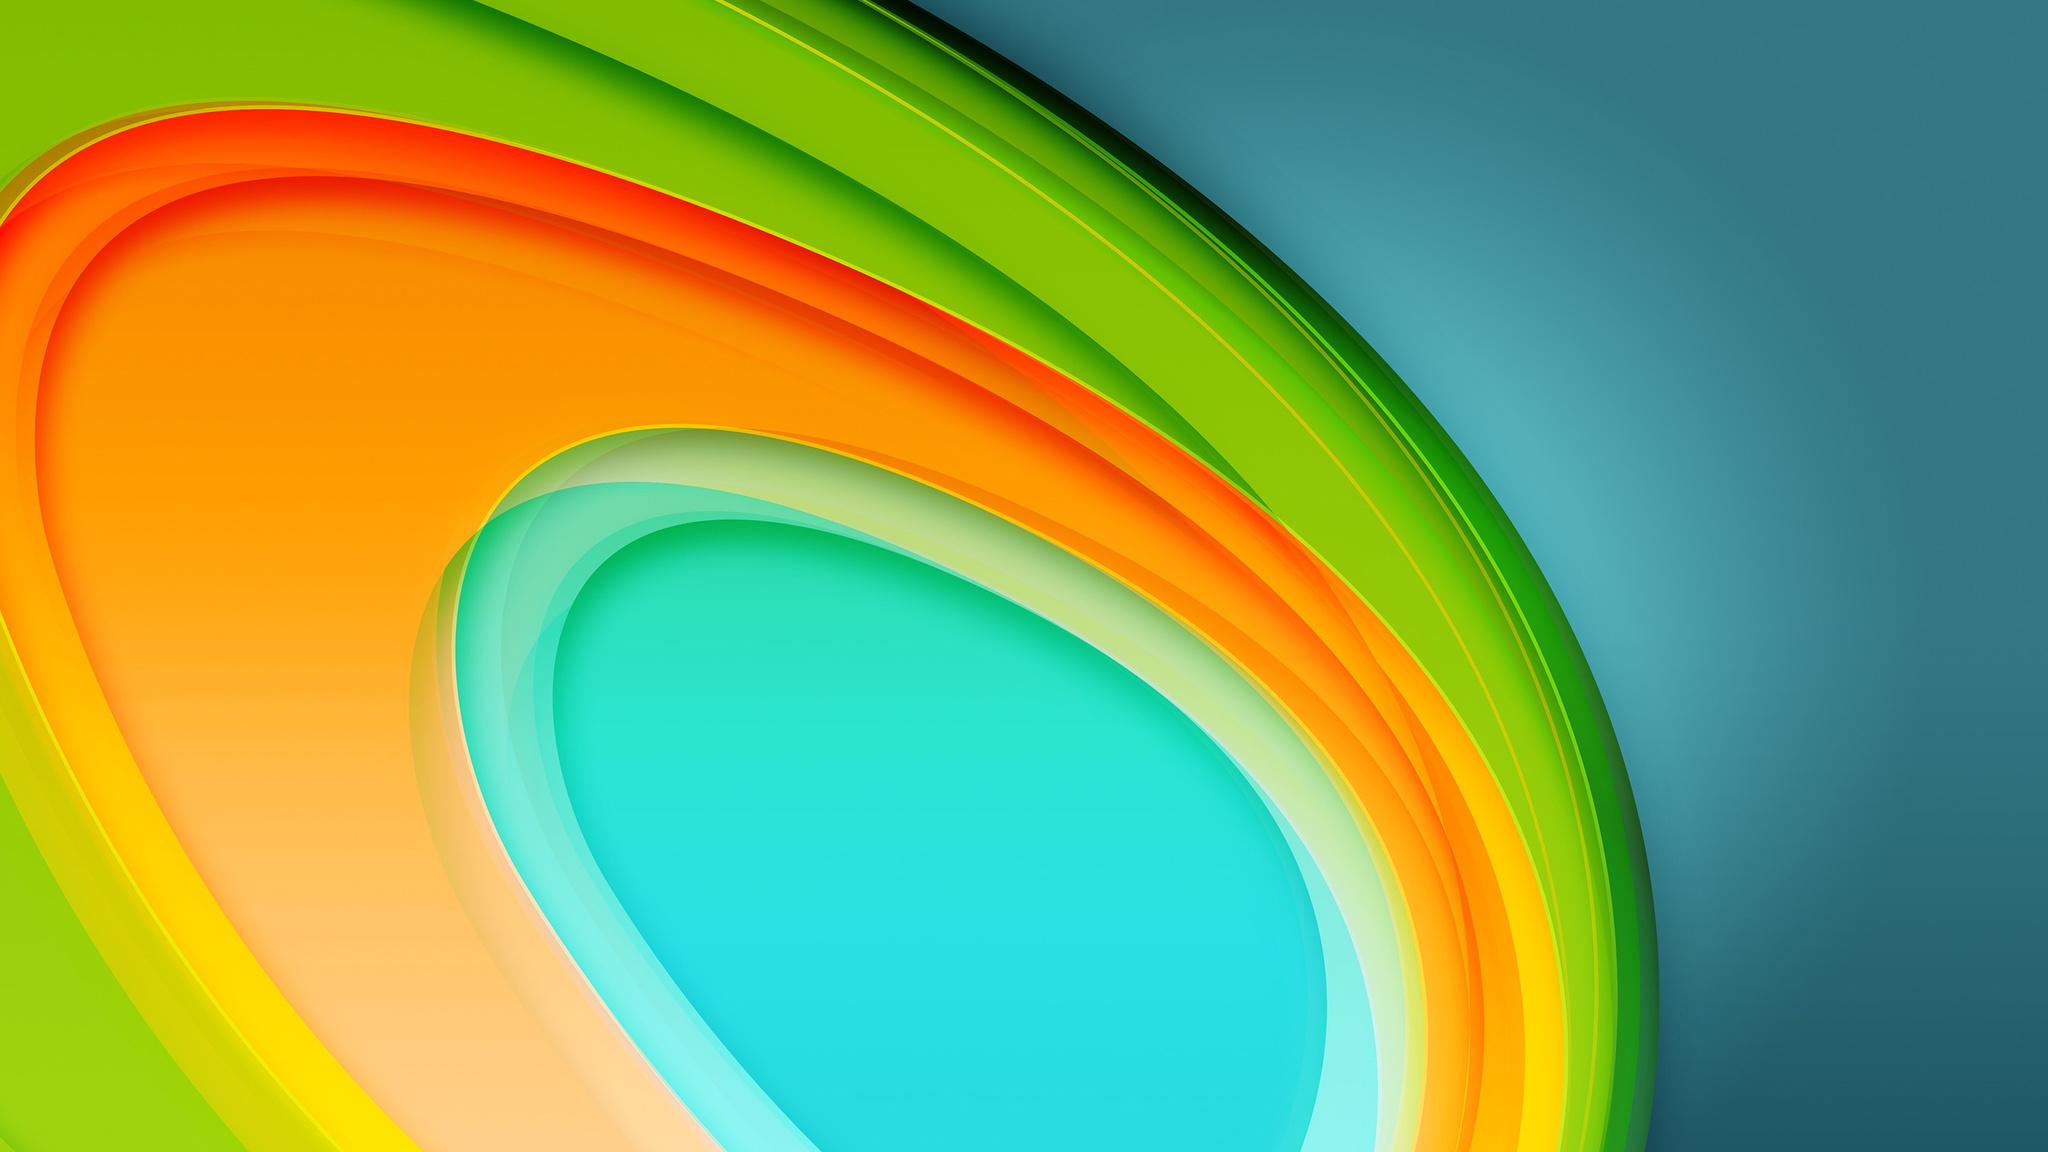 Colorful Circles 4K 5K (2048x1152)